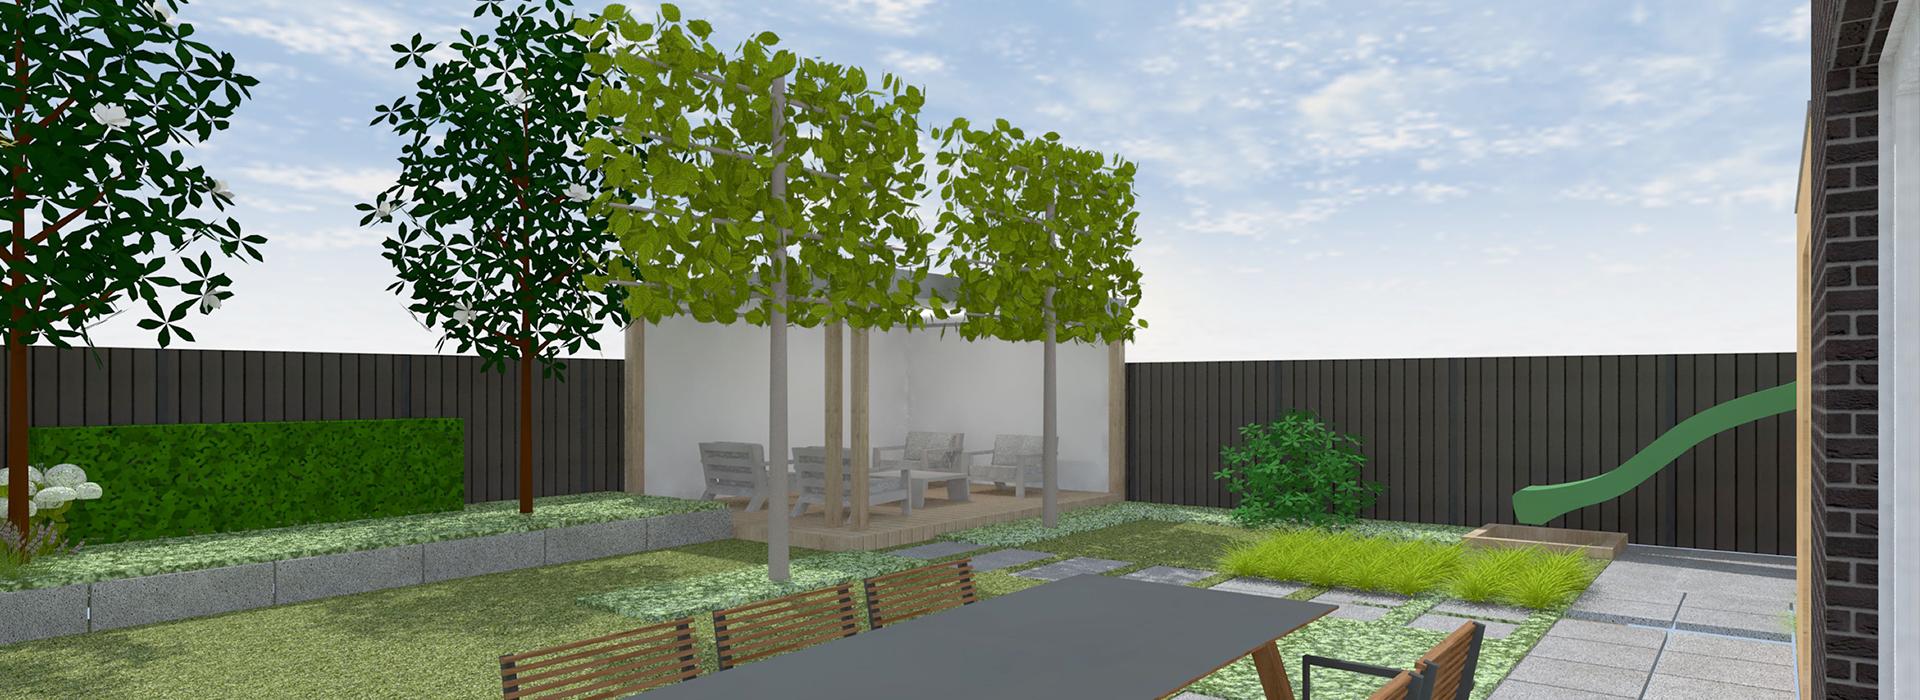 Programma tuin stunning d tuin ontwerpen sander langkamp for Tuin programma